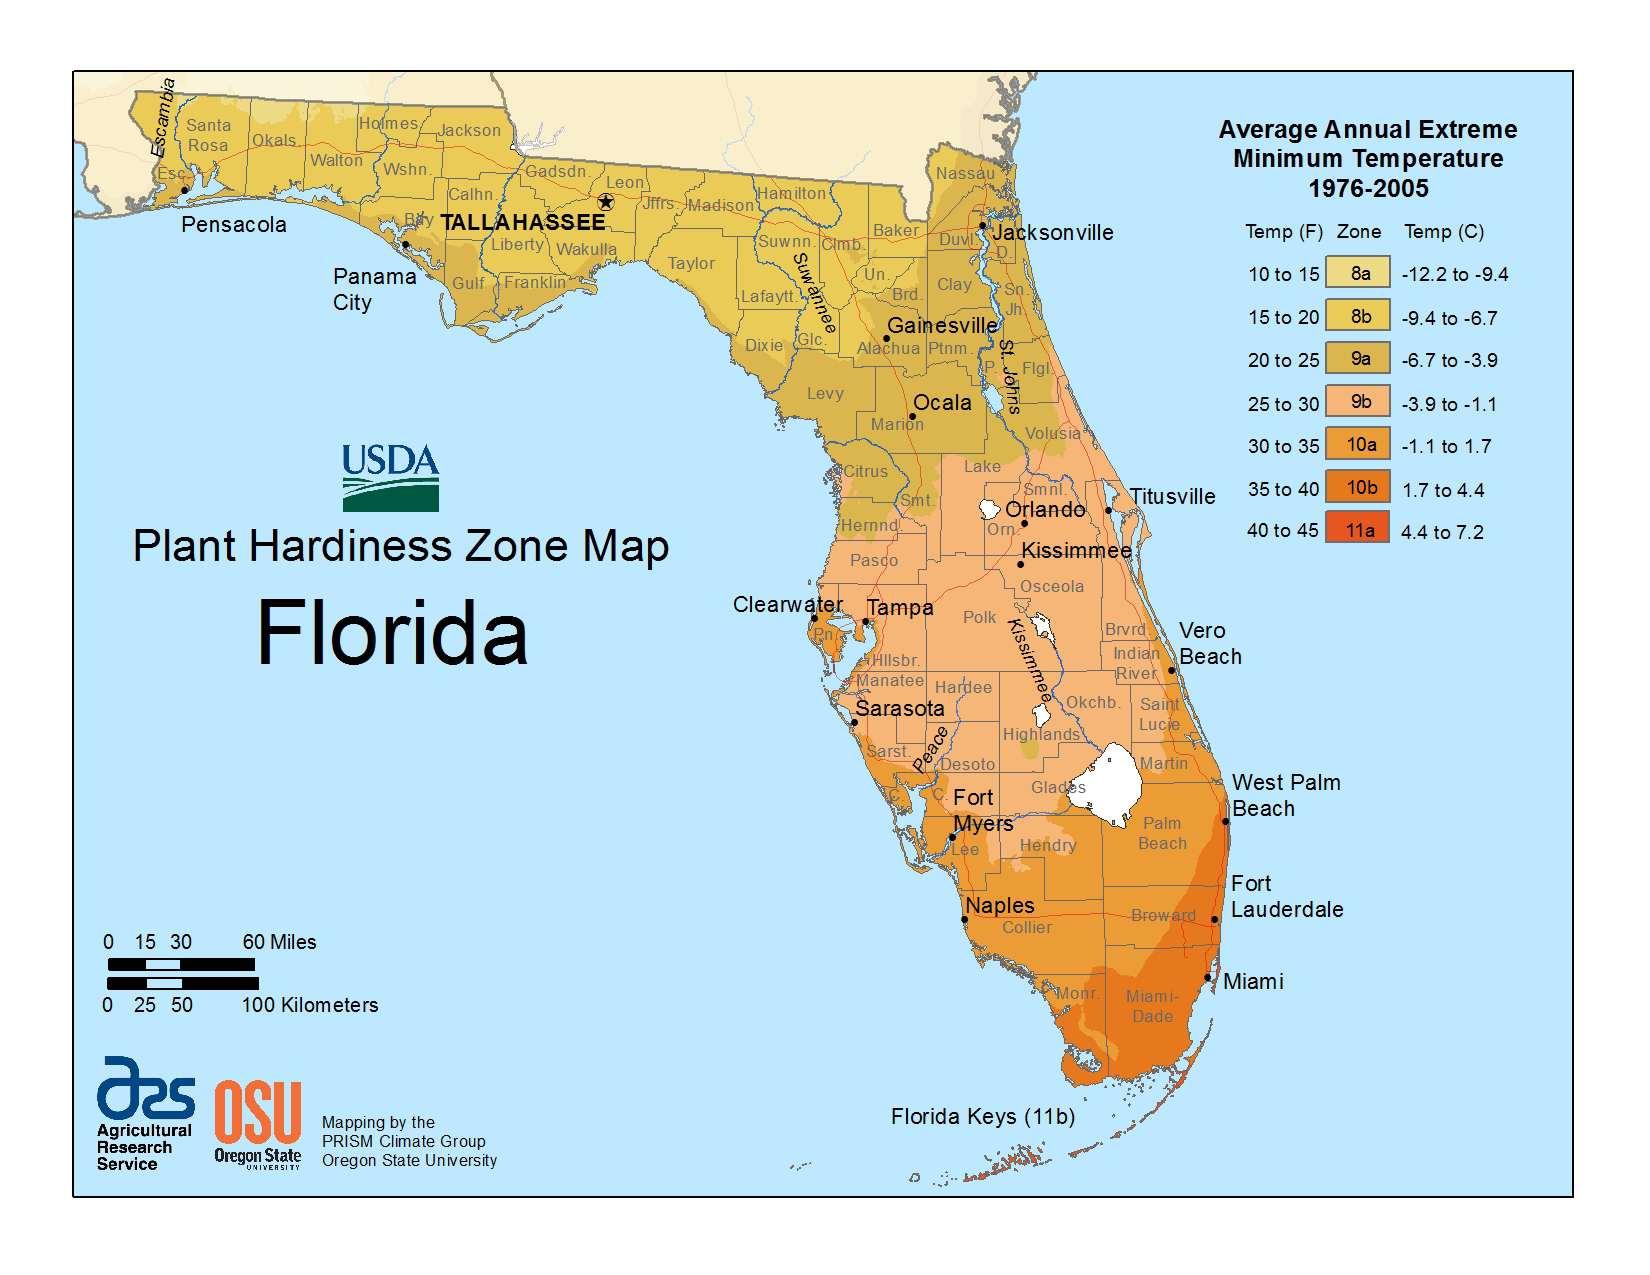 Usda Loan Map Florida State Maps of USDA Plant Hardiness Zones